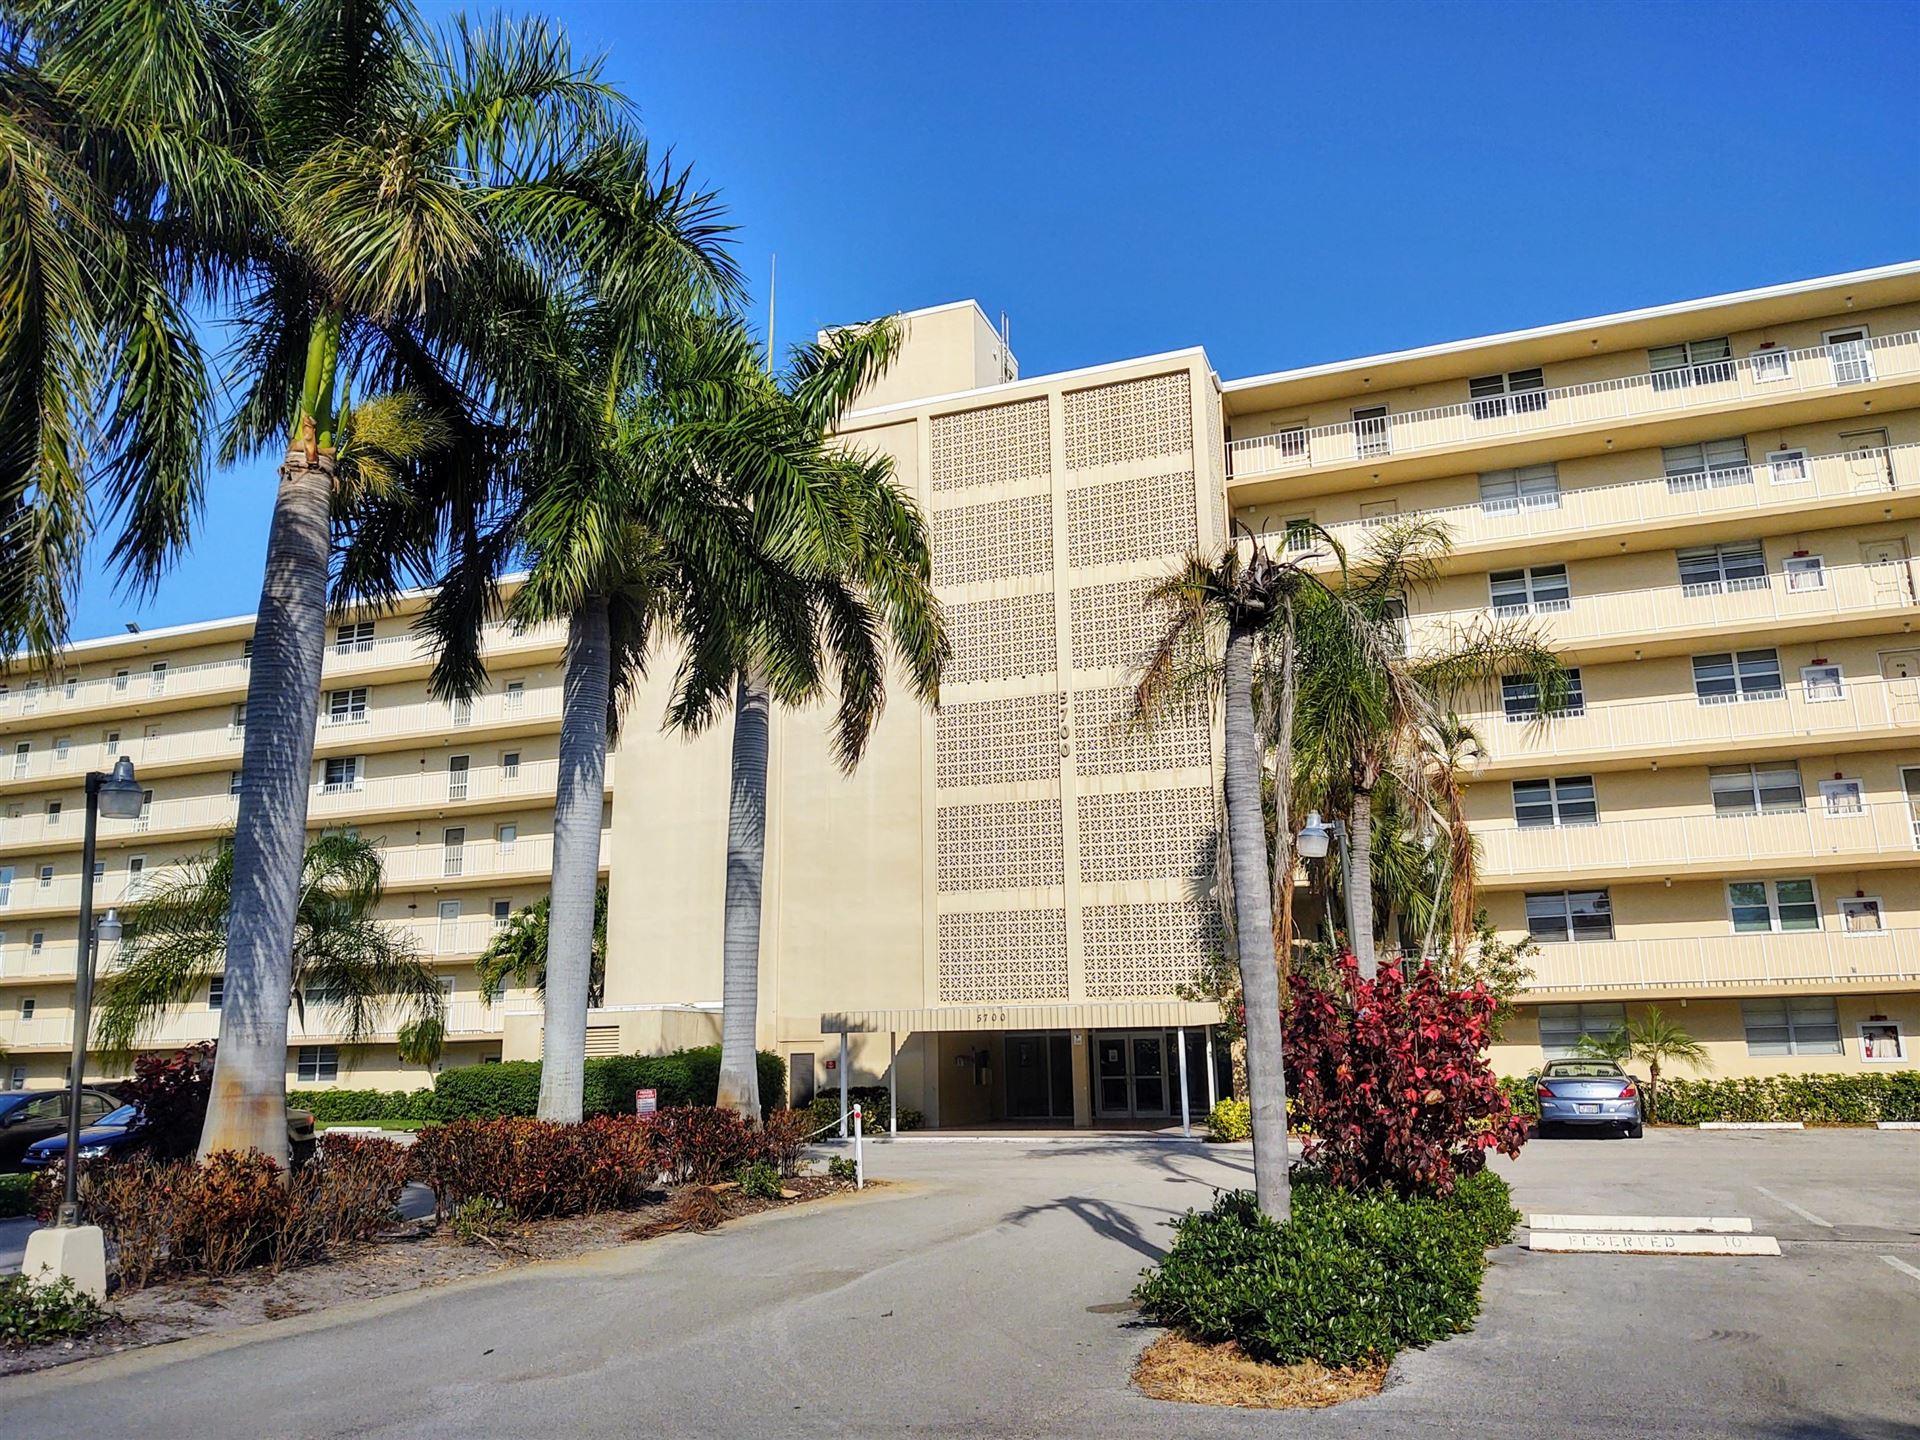 5700 NW 2nd Avenue #605, Boca Raton, FL 33487 - MLS#: RX-10704538